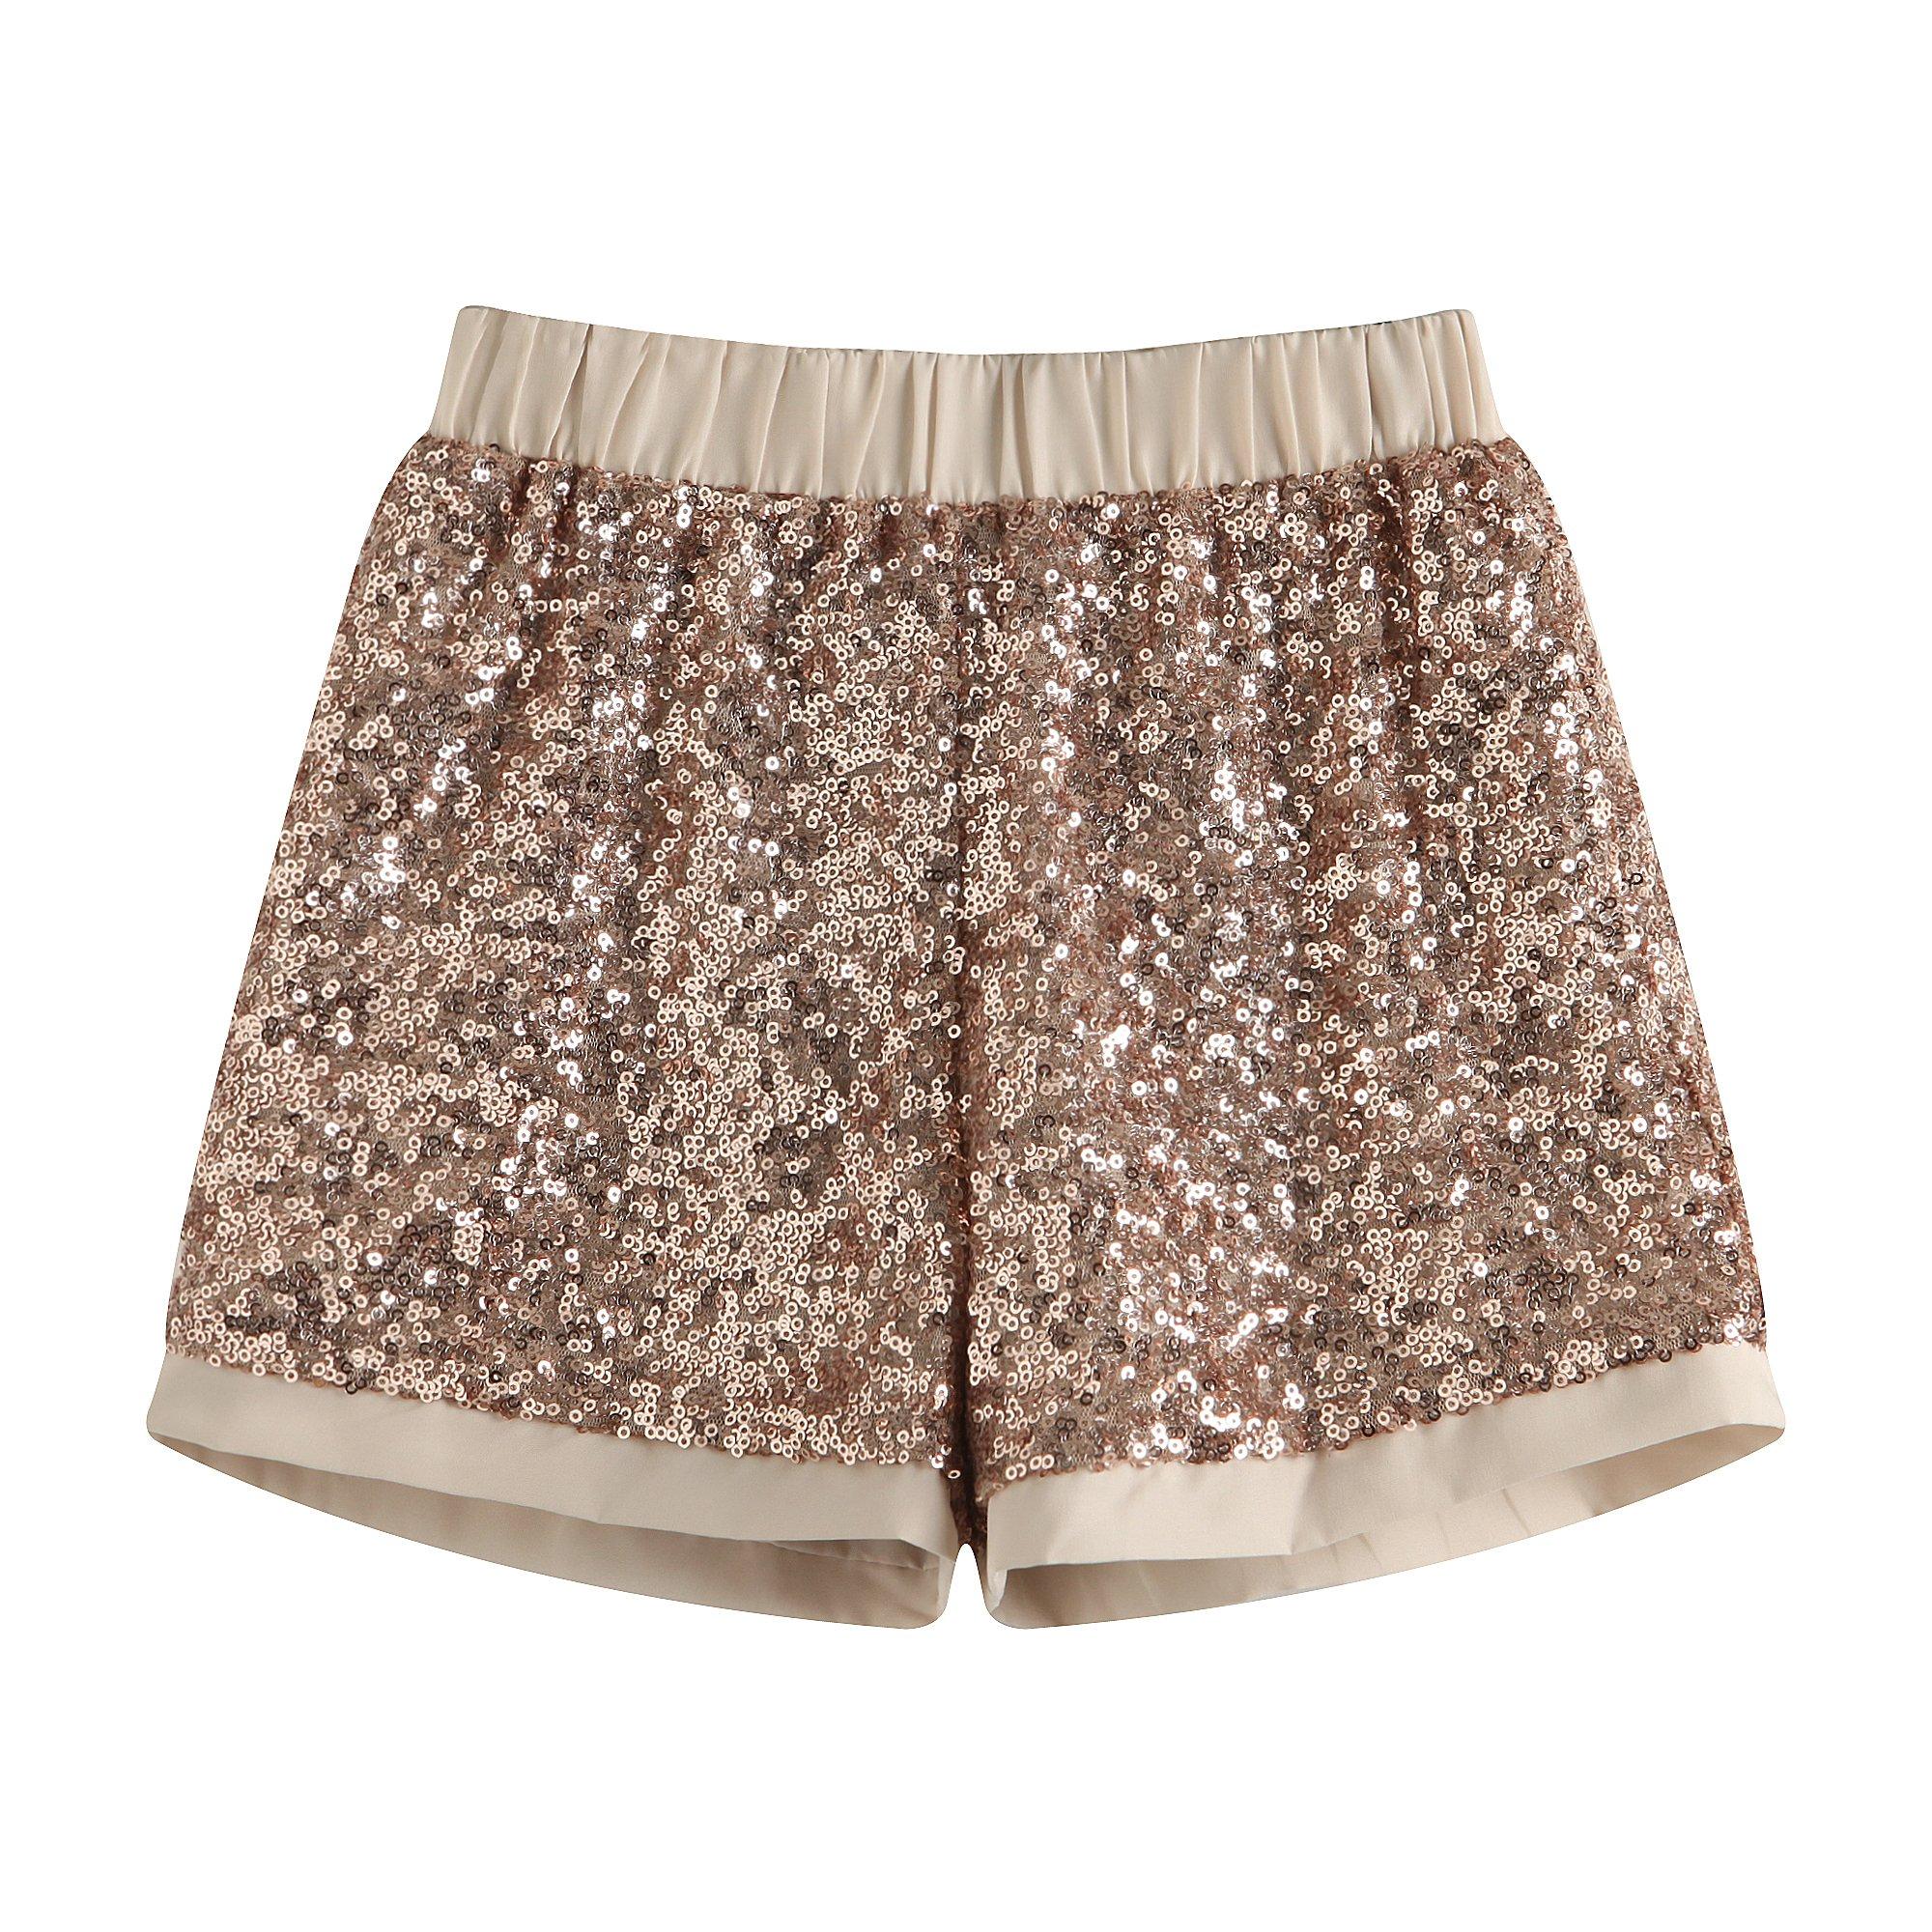 Richie House Little Big Girls' Short Pants with Sequins RH1854